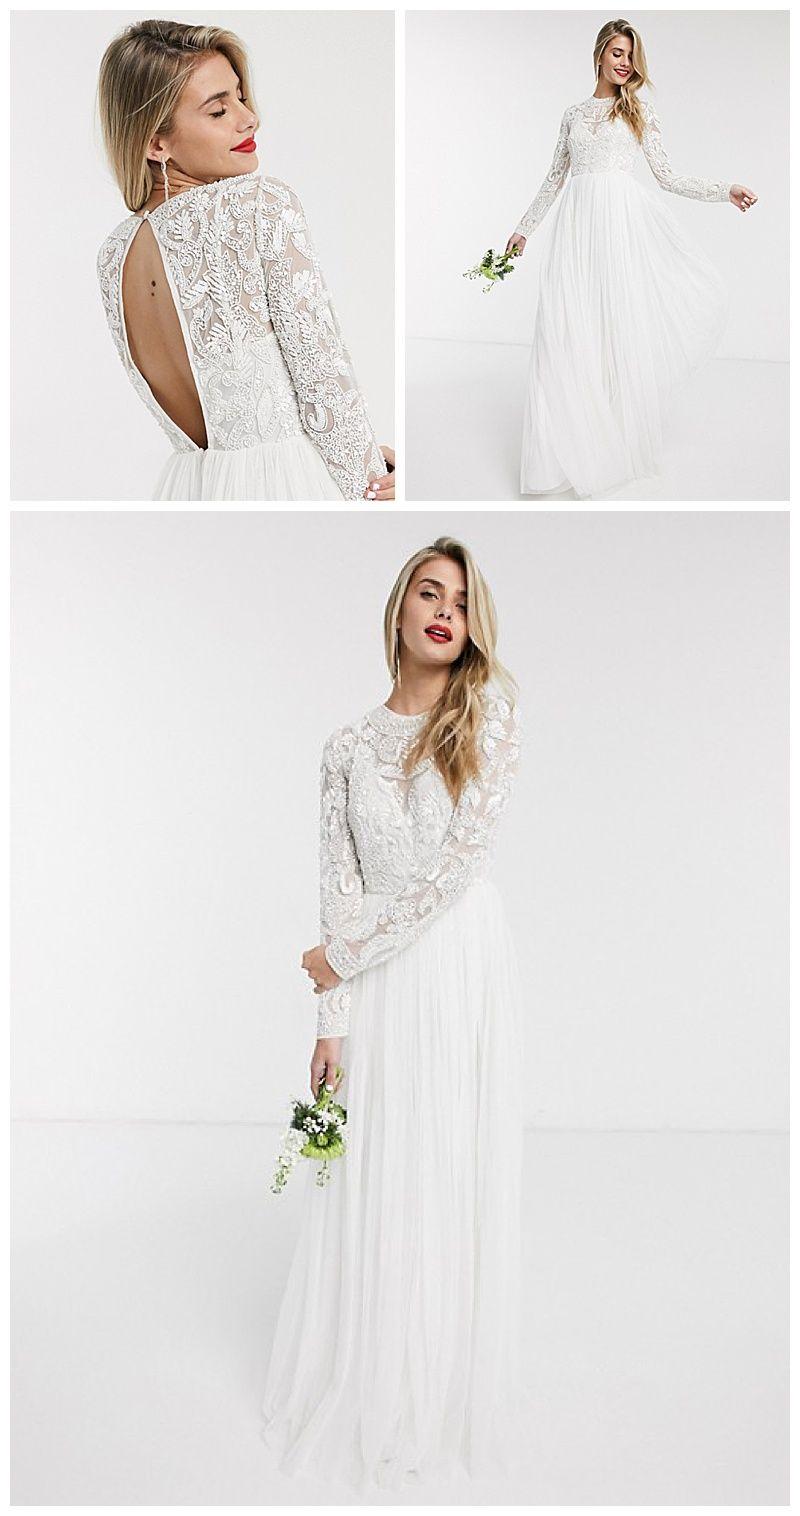 The 200 Beaded Wedding Dress Which Will Take Your Breath Away In 2020 Asos Wedding Dress Bodice Wedding Dress Wedding Dresses